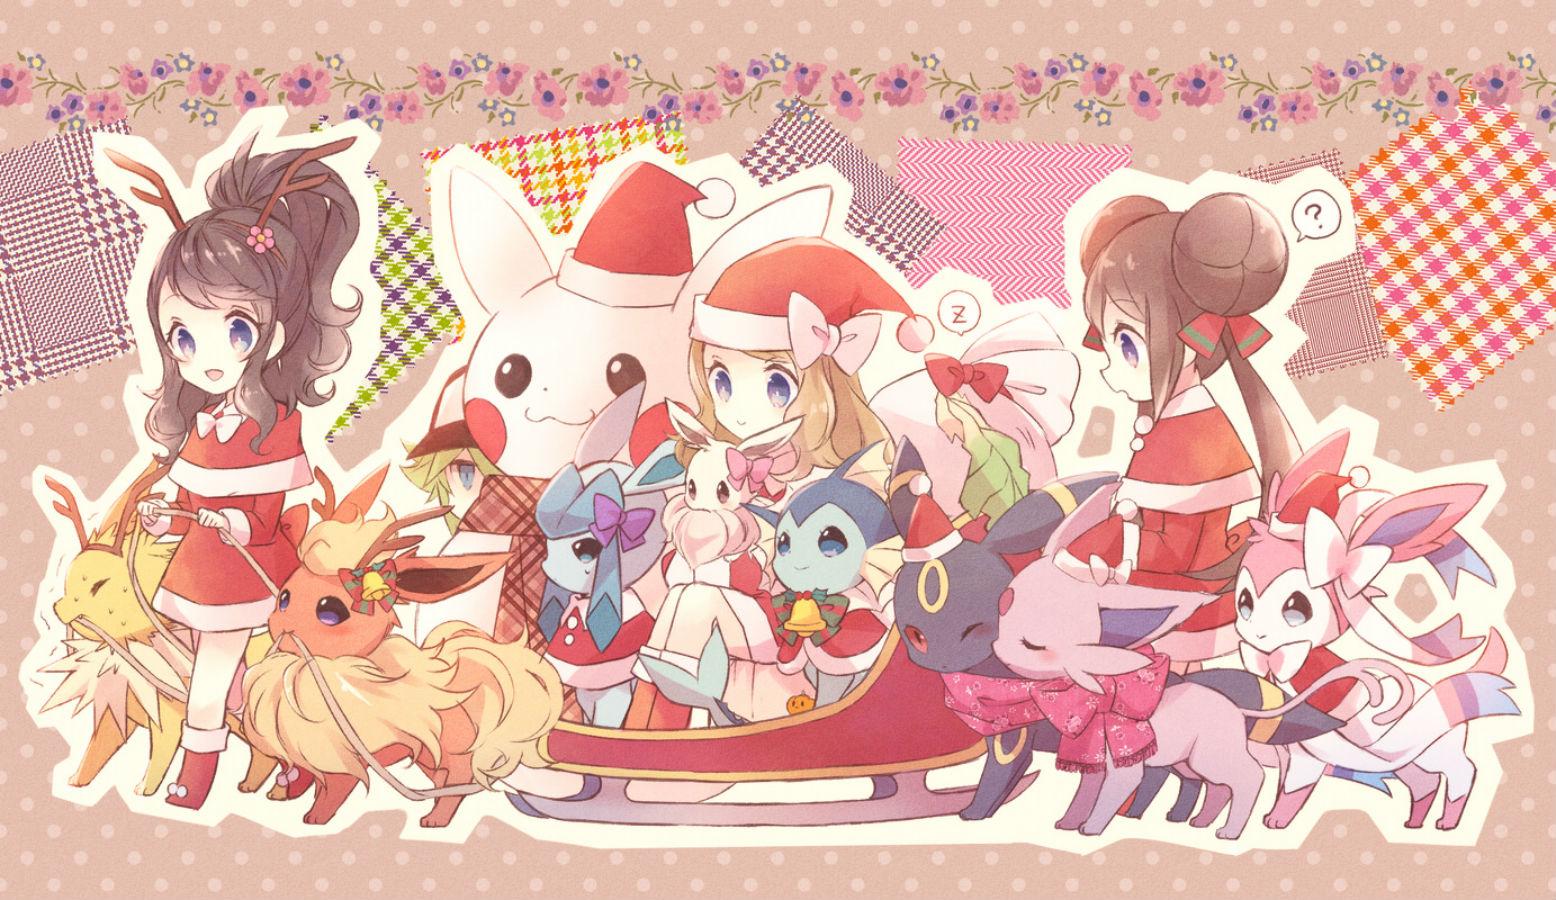 Pokemon bell bow christmas eevee espeon flareon flowers glaceon ...